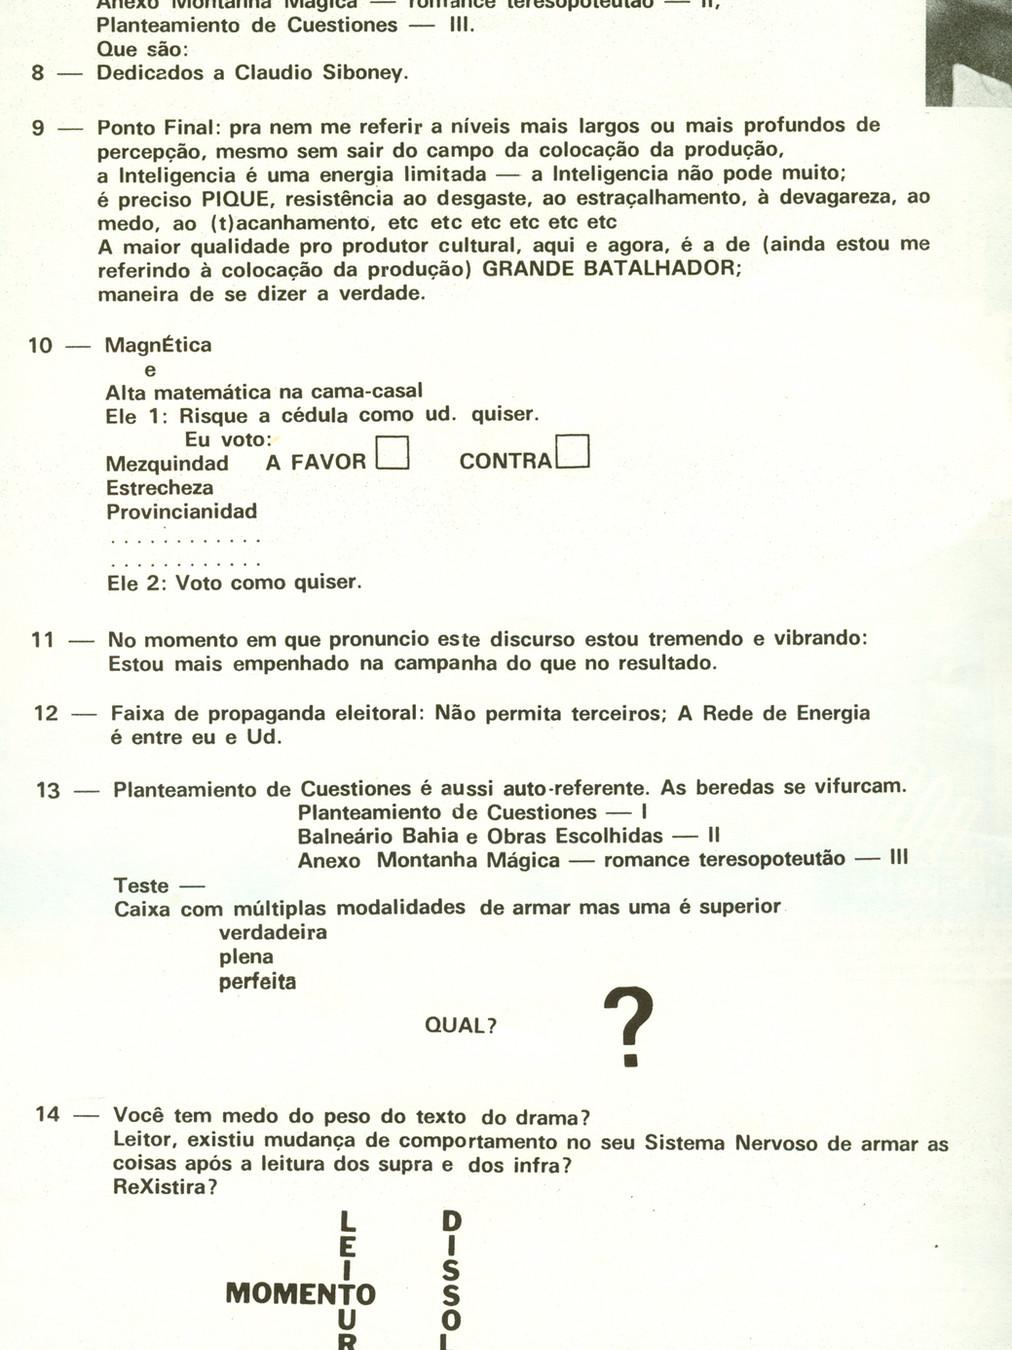 pag 16.jpg